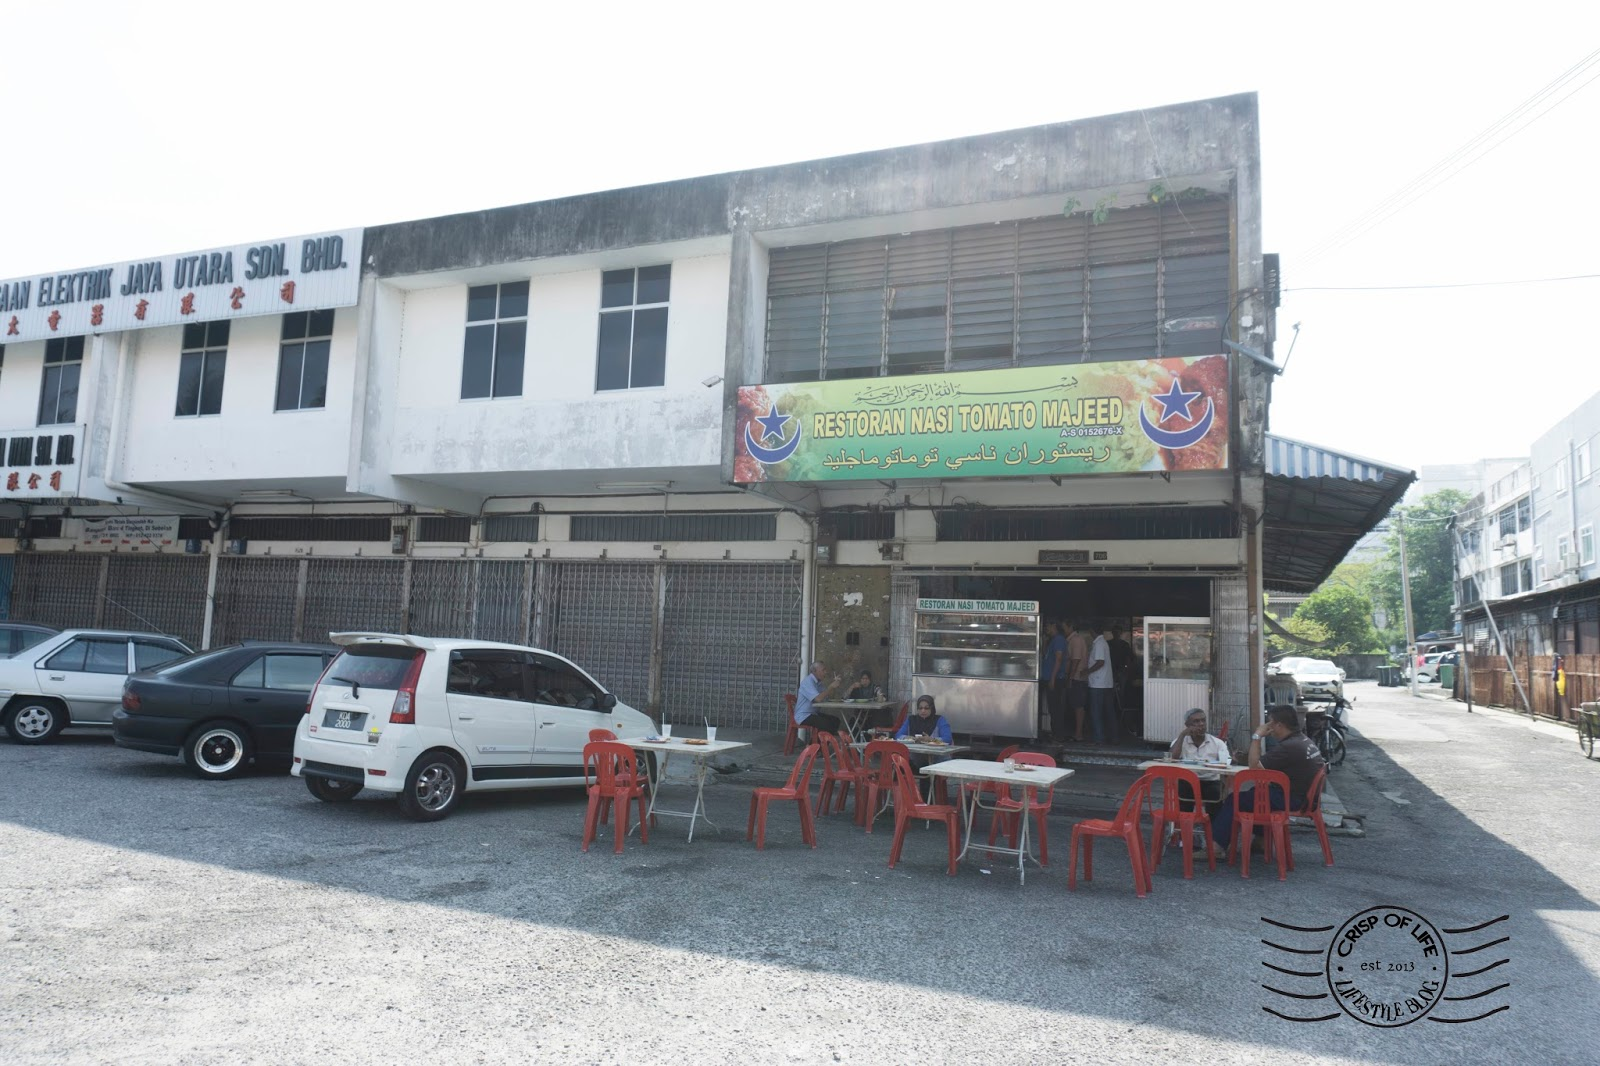 Restoran Nasi Tomato Majeed Alor Setar